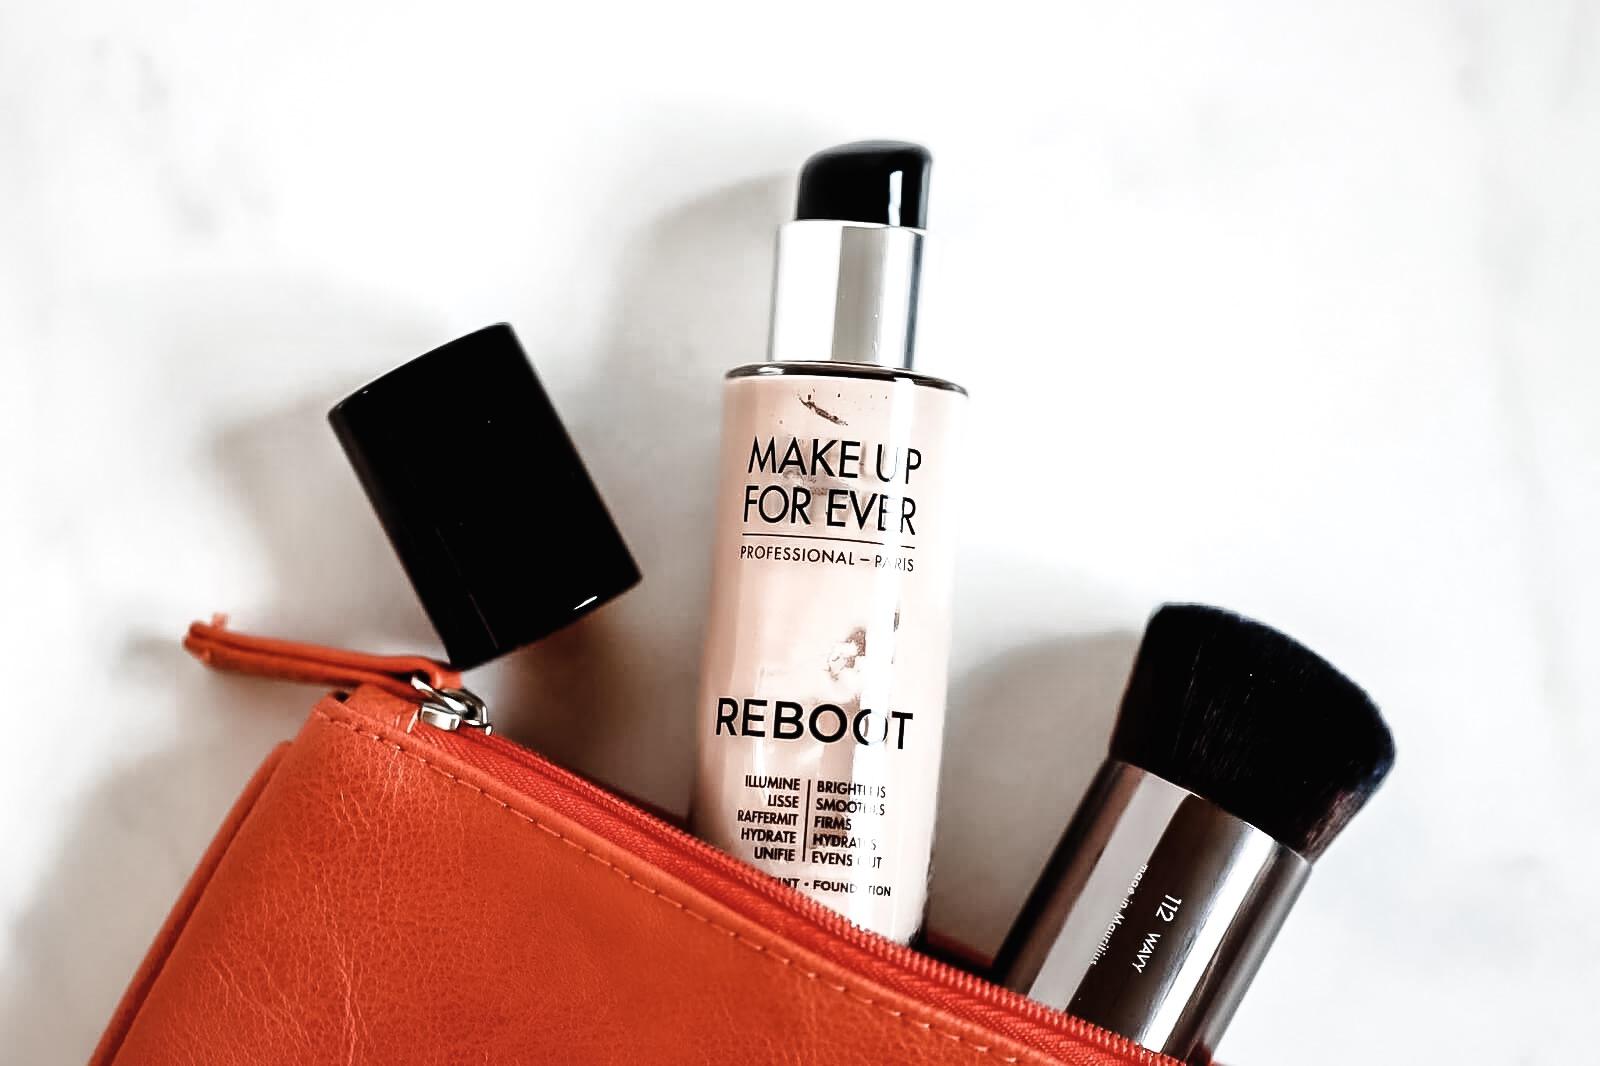 make-up-for-ever-reboot-avis-test-avant-apres